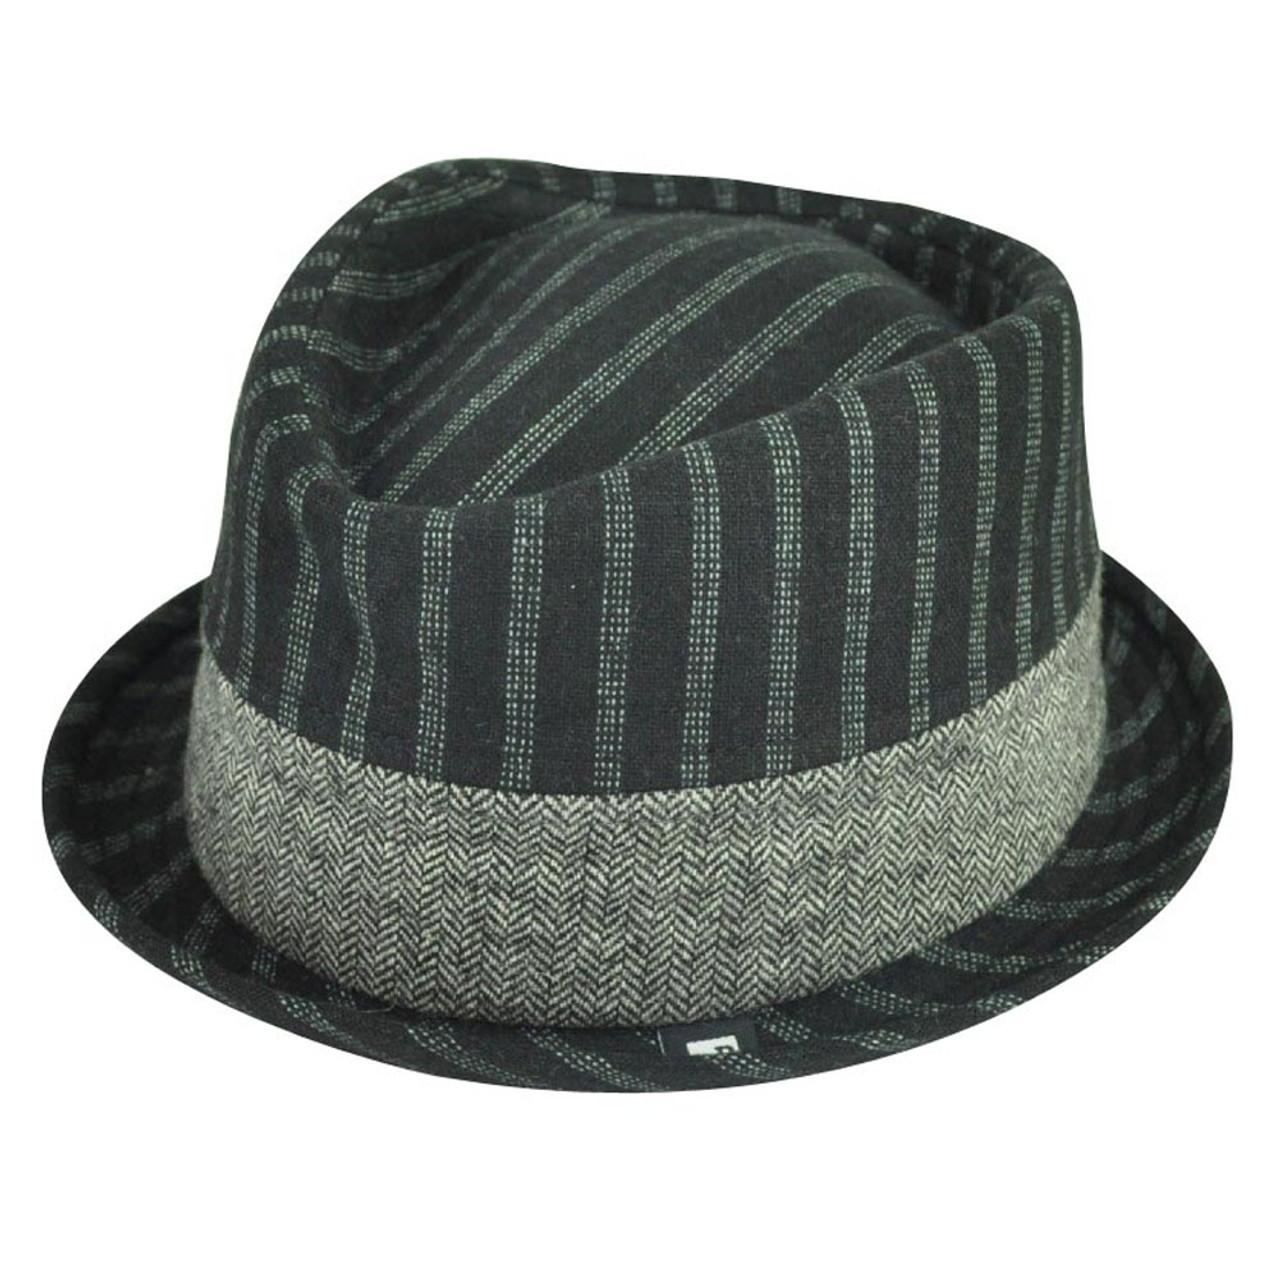 39c81f80539fa Block Headwear Brand Pinstripe Herringbone Blk Fedora Stetson Trilby Hat  Large - Cap Store Online.com